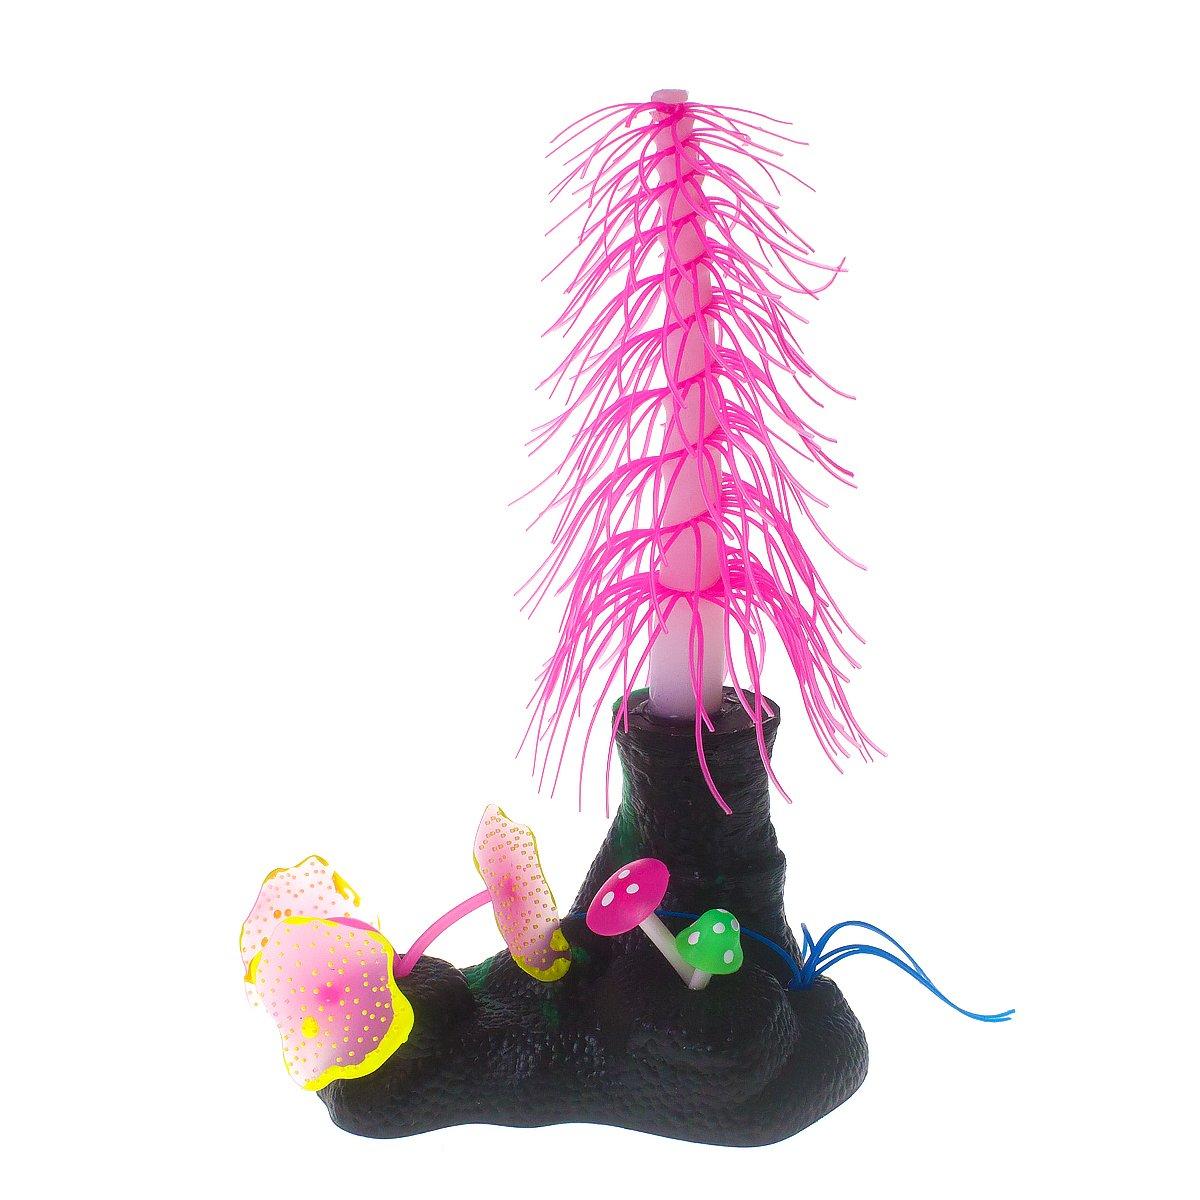 Fuchsia Pack of 1 Fuchsia Pack of 1 Saim Aquarium Artificial Decorative Christmas Tree with Mushroom Coral Plants Ornament Decor for Fish Tank Decorations, Fuchsia